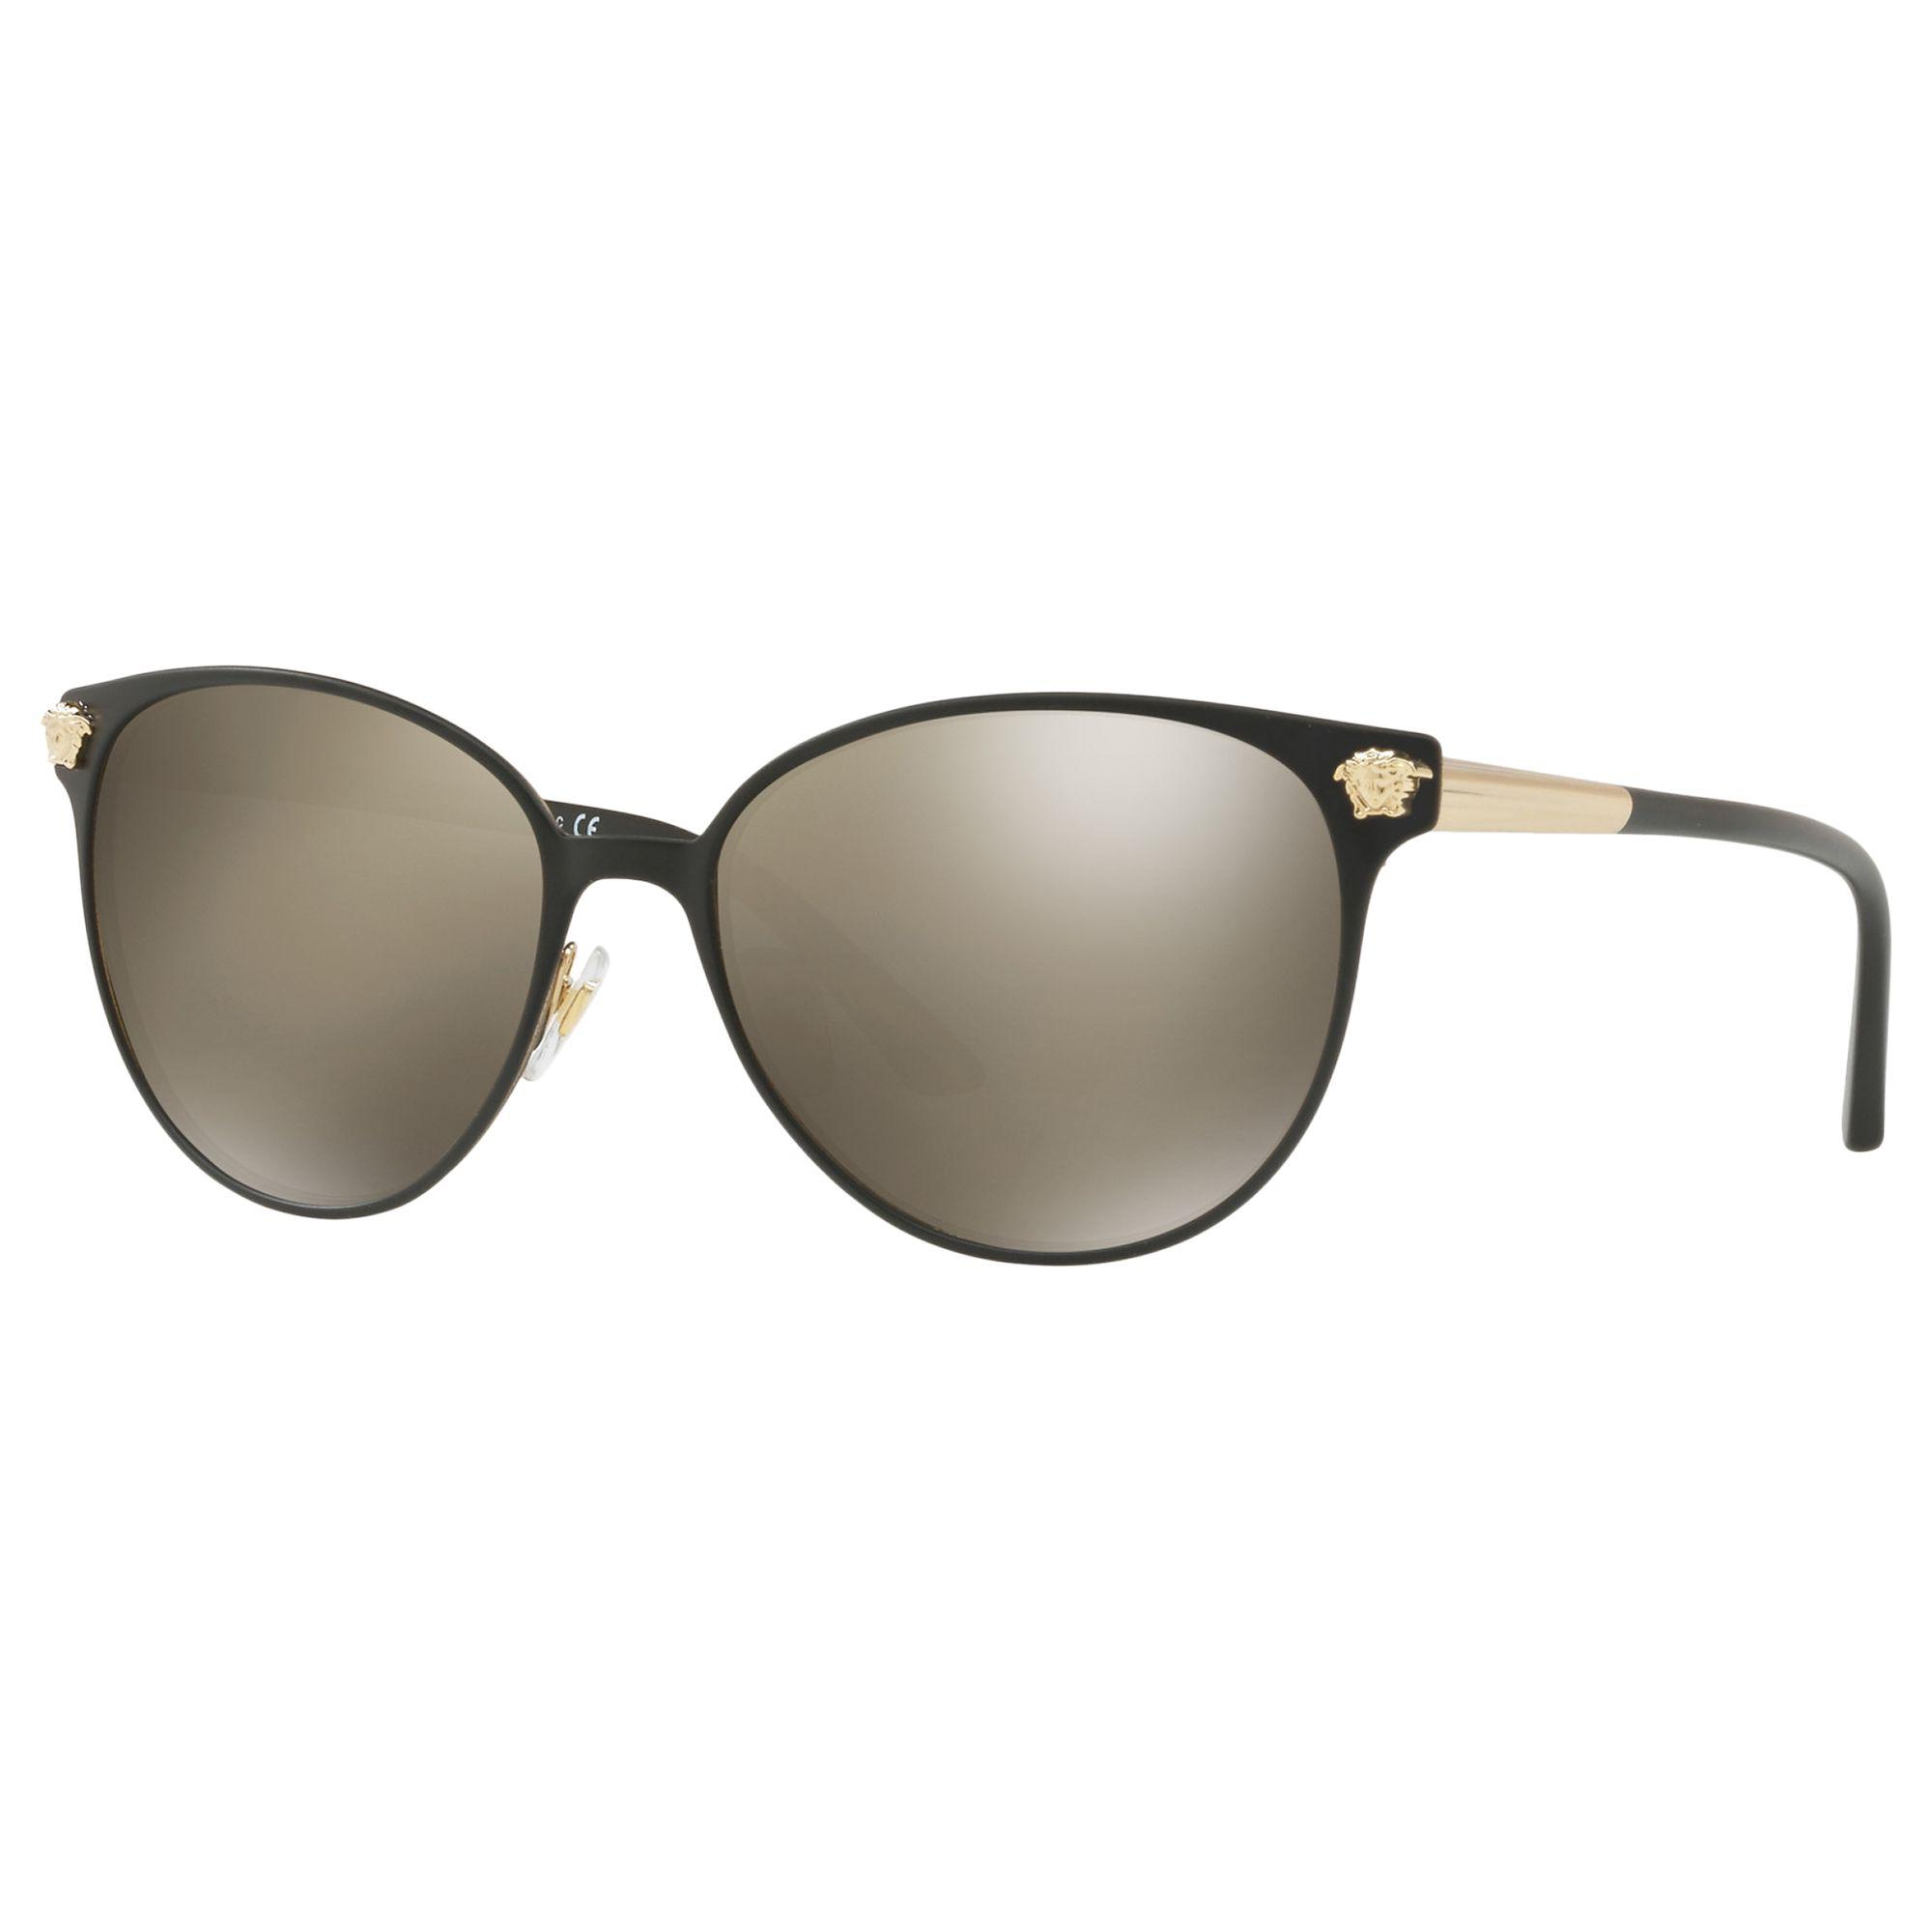 f720013255646 Versace Ve2168 Men s Oval Sunglasses in Brown for Men - Lyst